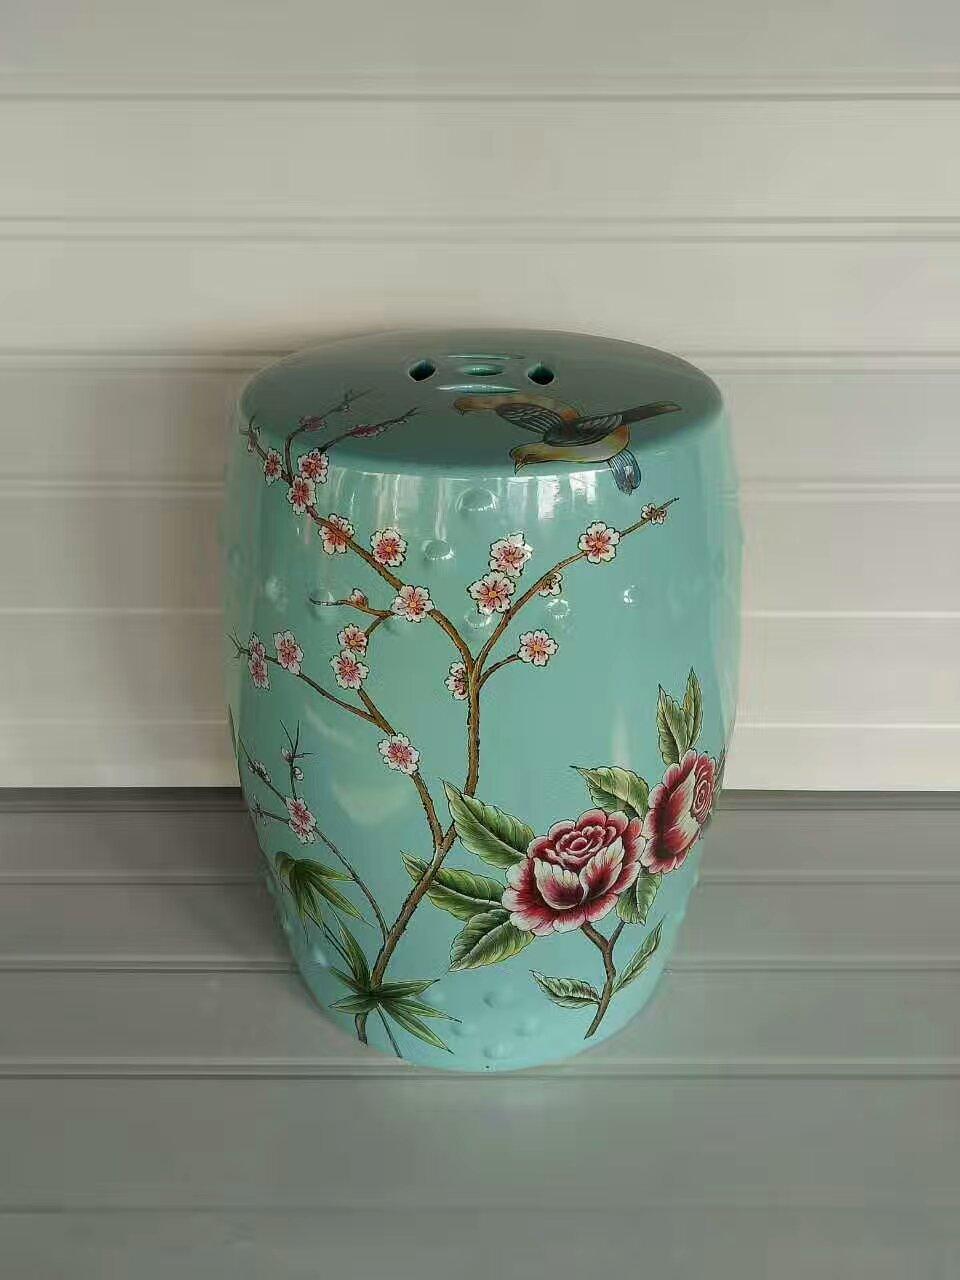 Aliexpress.com : Buy Classical Jindezhen Dressing Table Ceramic Garden  Stool Chinese Ceramic Drum Stool Bathroom Chinese Gardening Stool From  Reliable ...